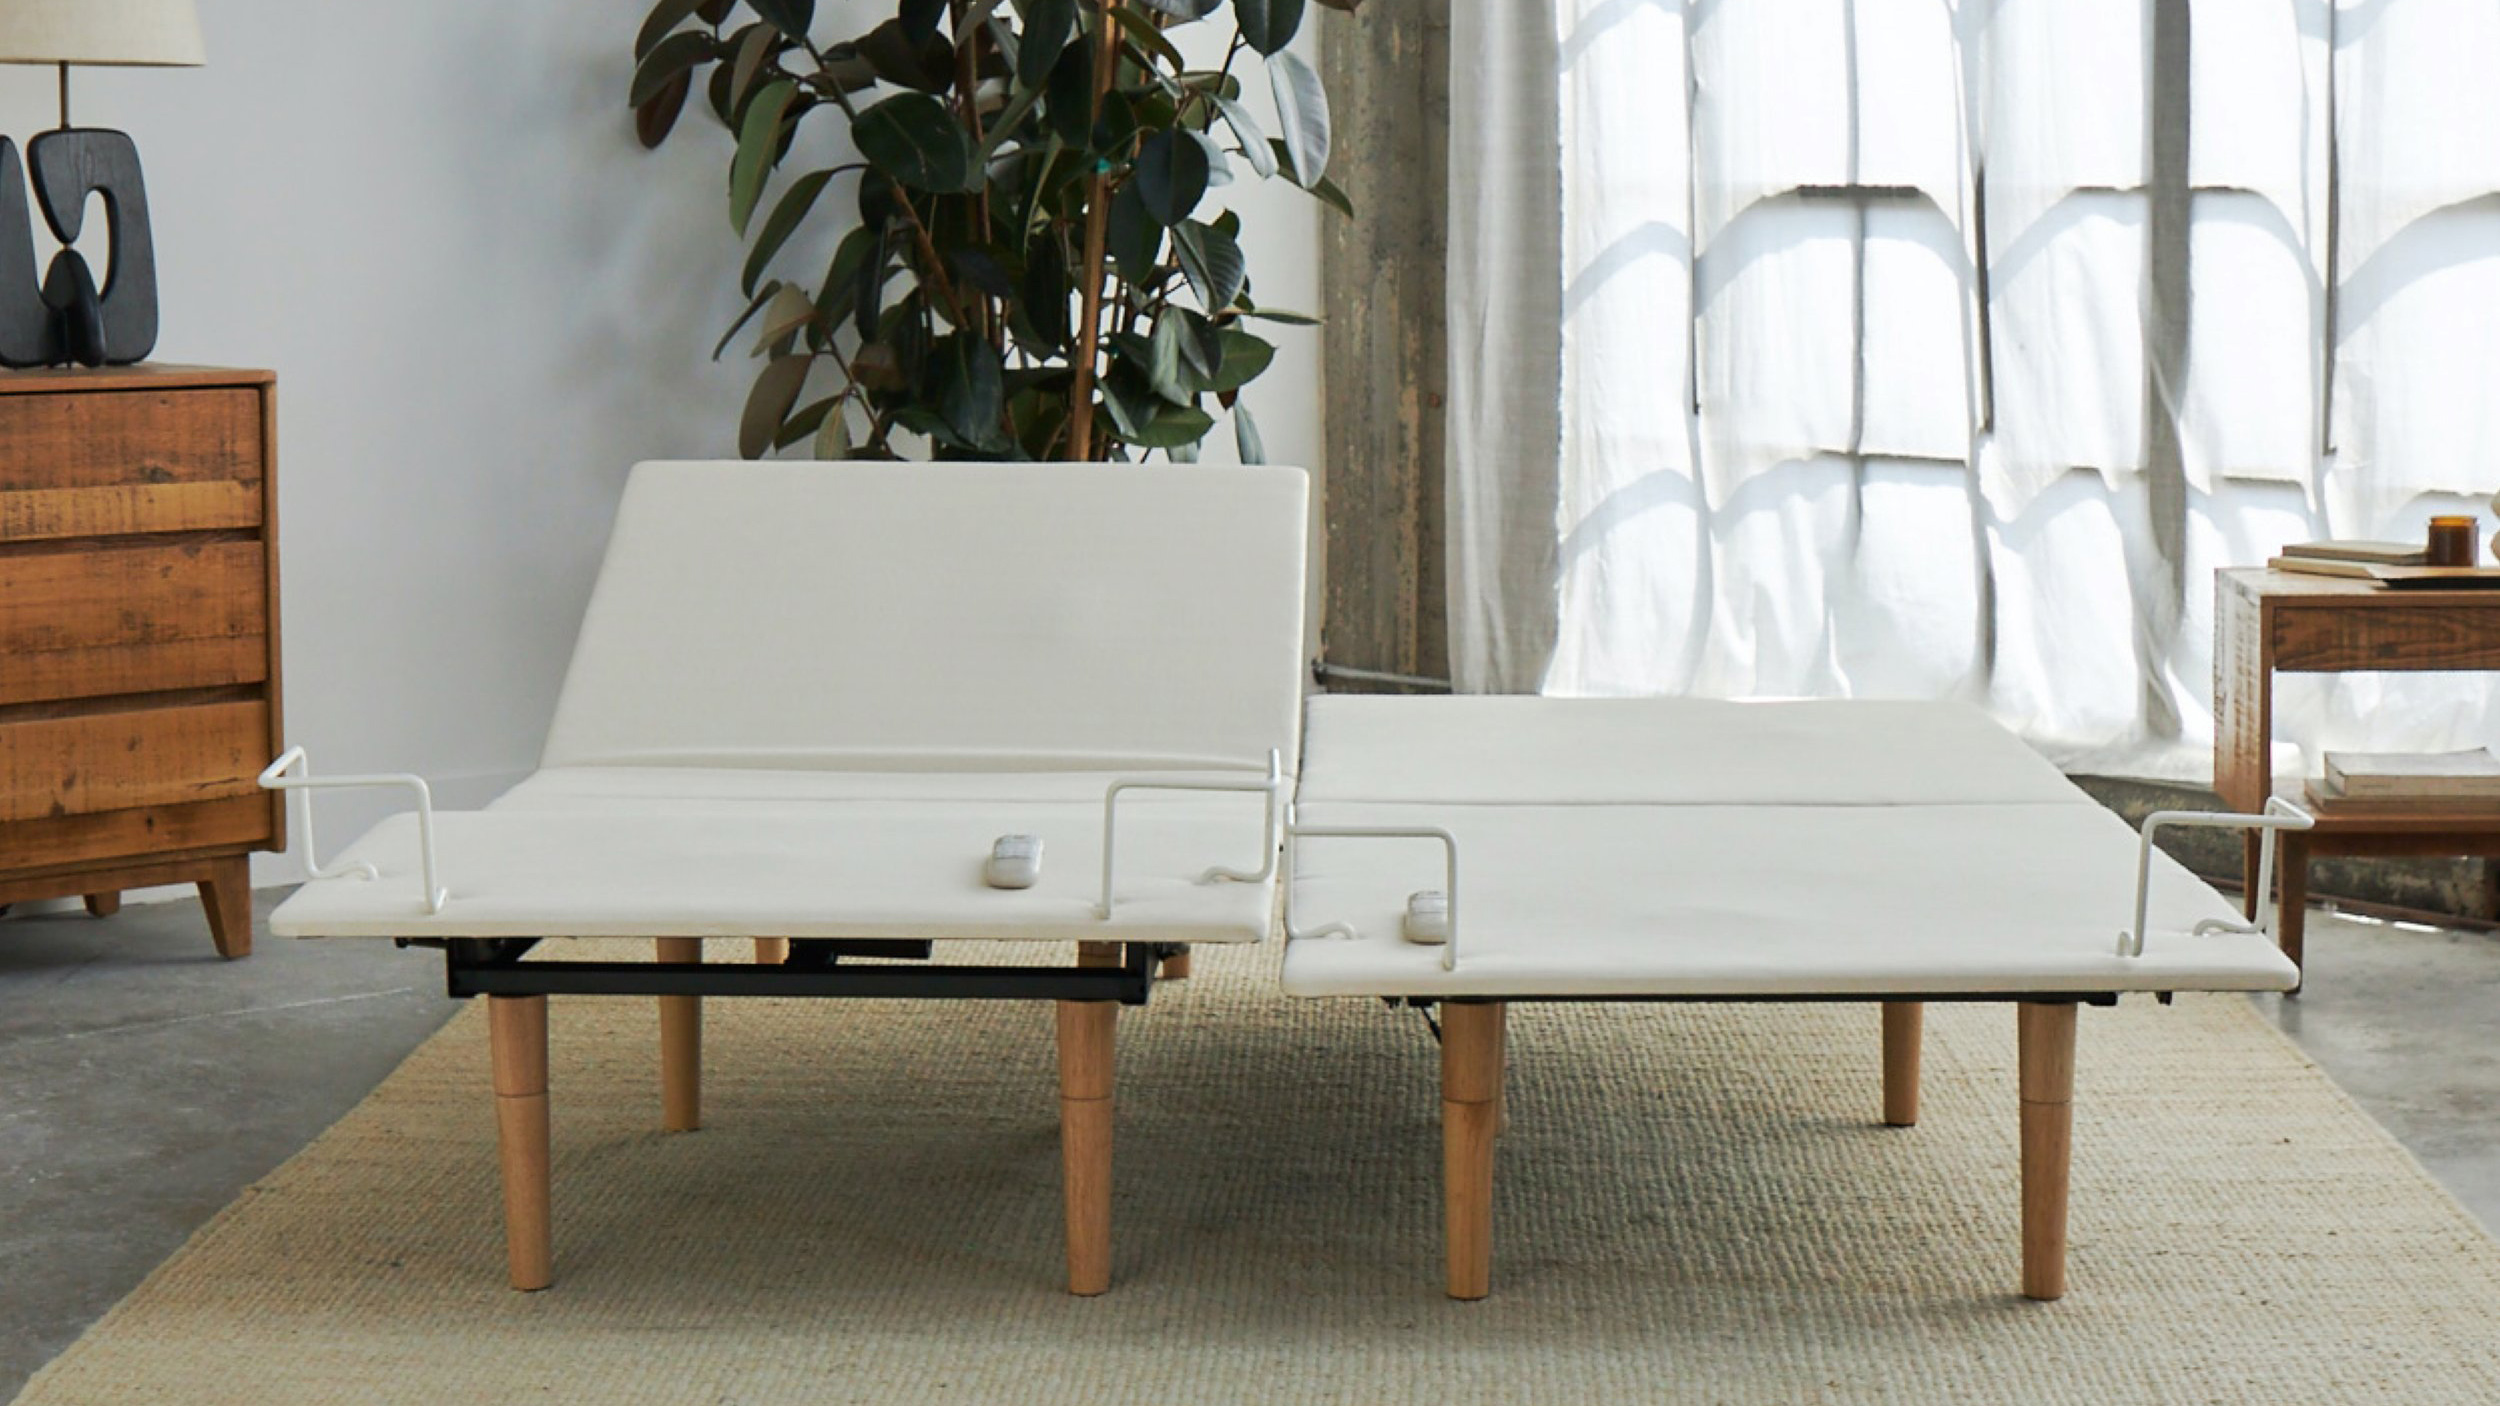 Avocado Green Mattress Eco Adjustable Base Bed Frame